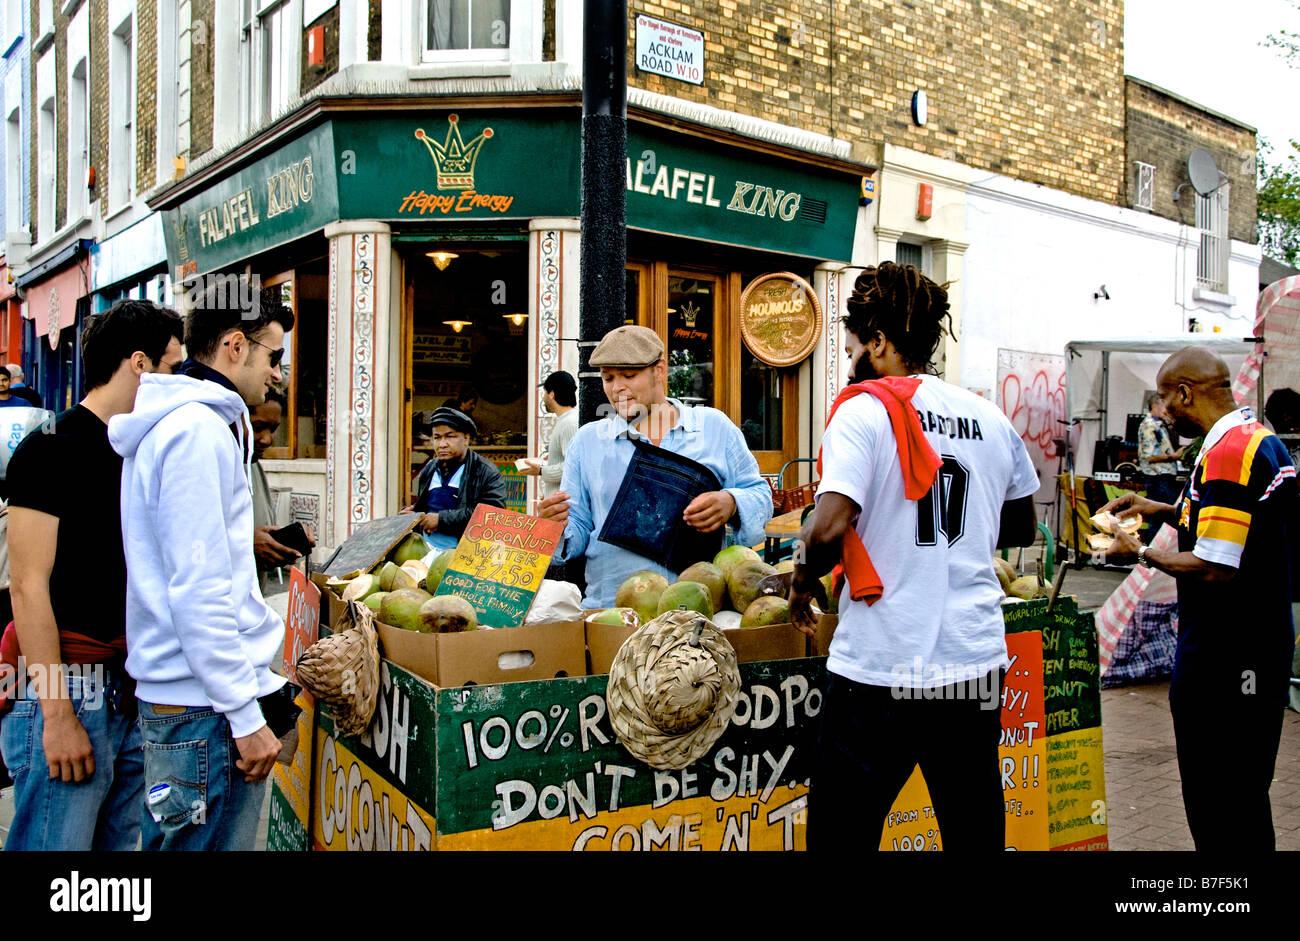 Portobello Road Market Notting Hill Greengrocer Stock Photo